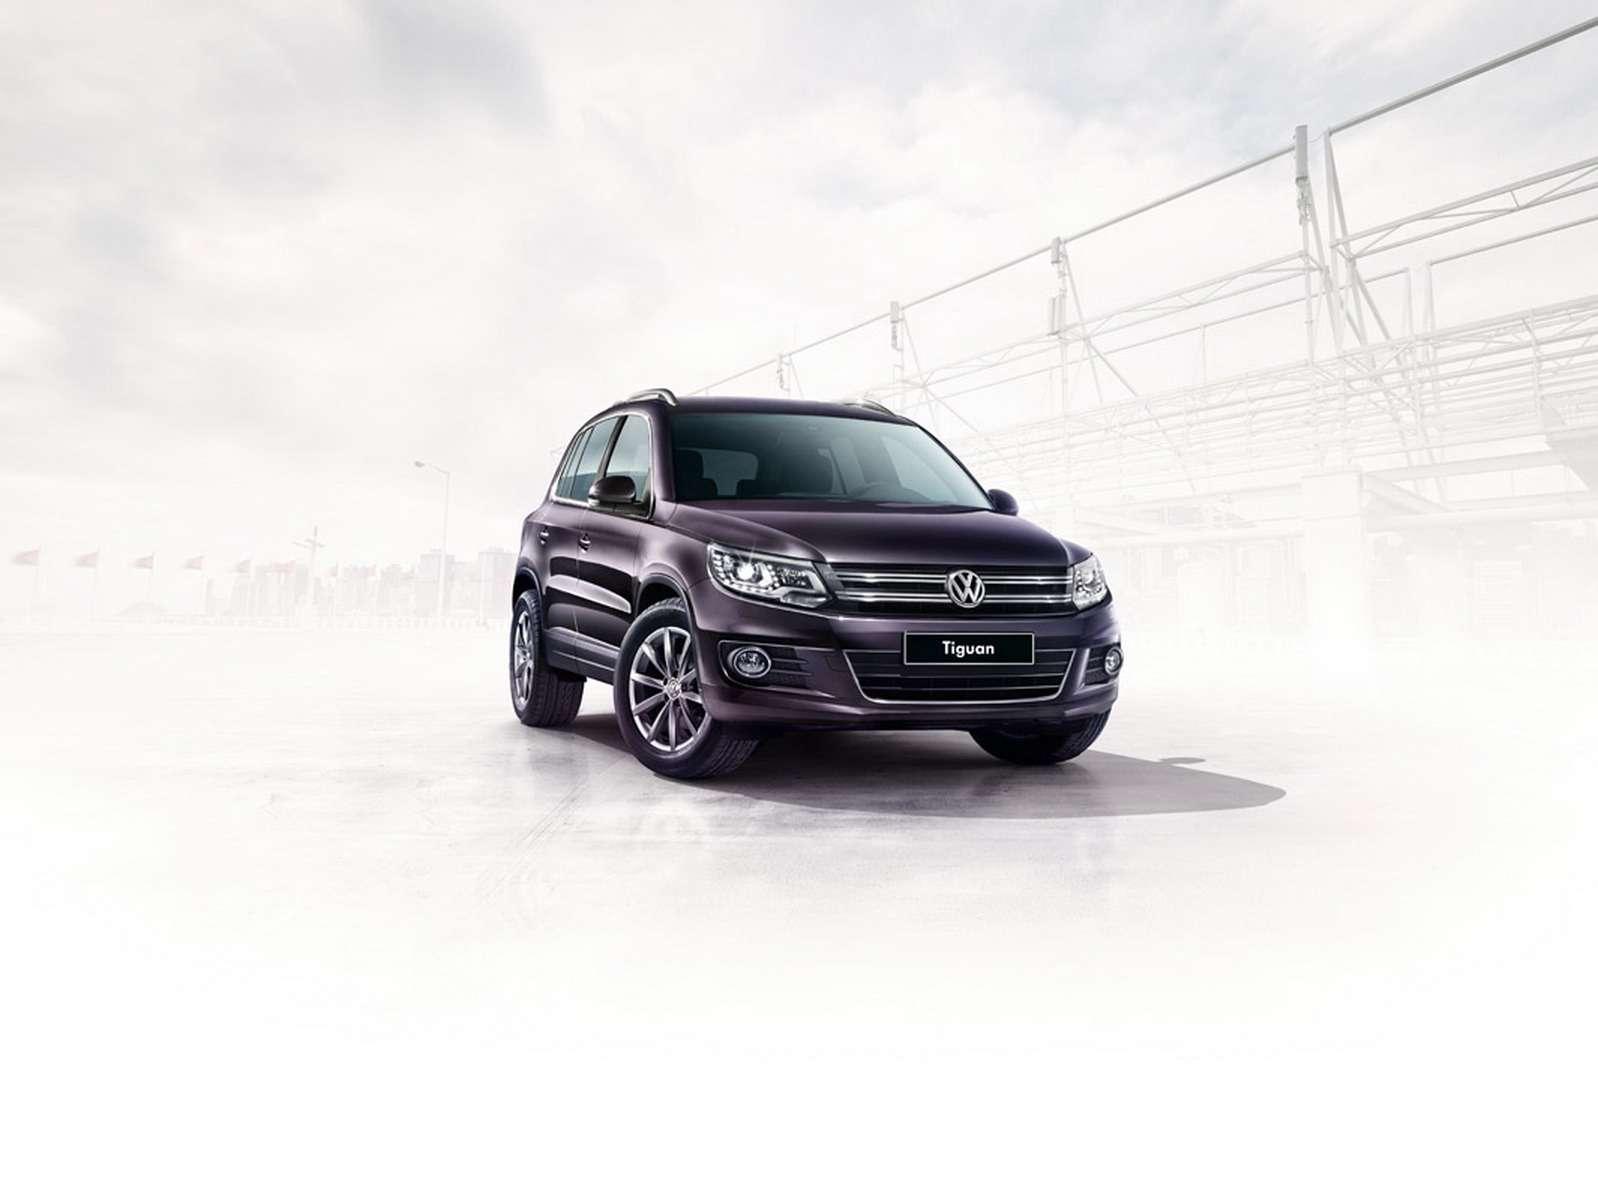 Volkswagen_Tiguan_CLUB_новый размер